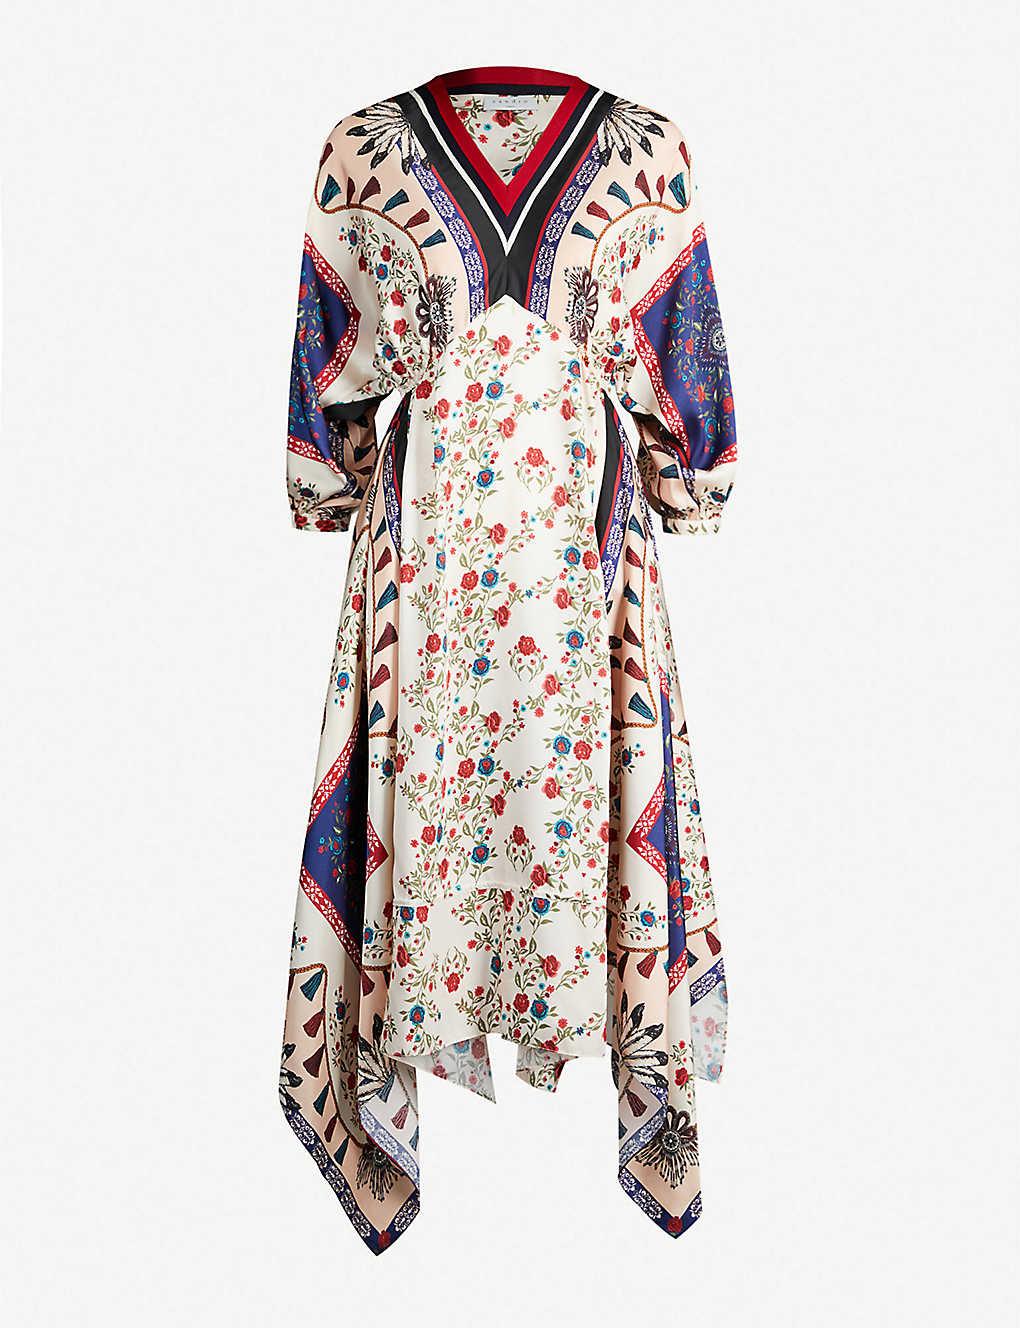 d2dd62de707 Mixed print V-neck short-sleeved satin dress - Multi color ...